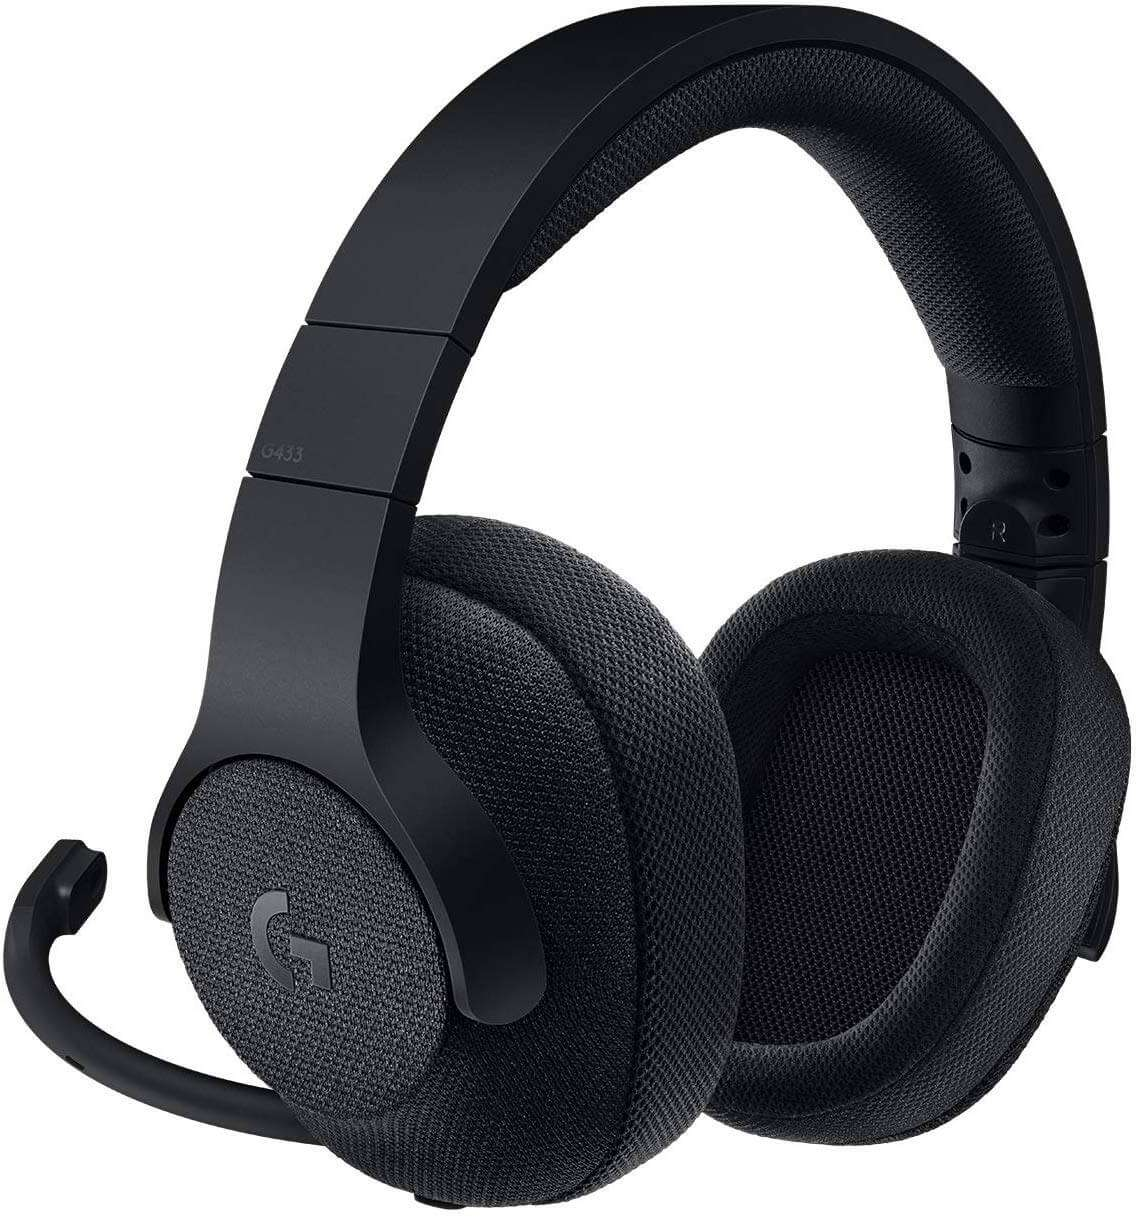 Logitech G433 Wired Gaming Headset - Triple Black